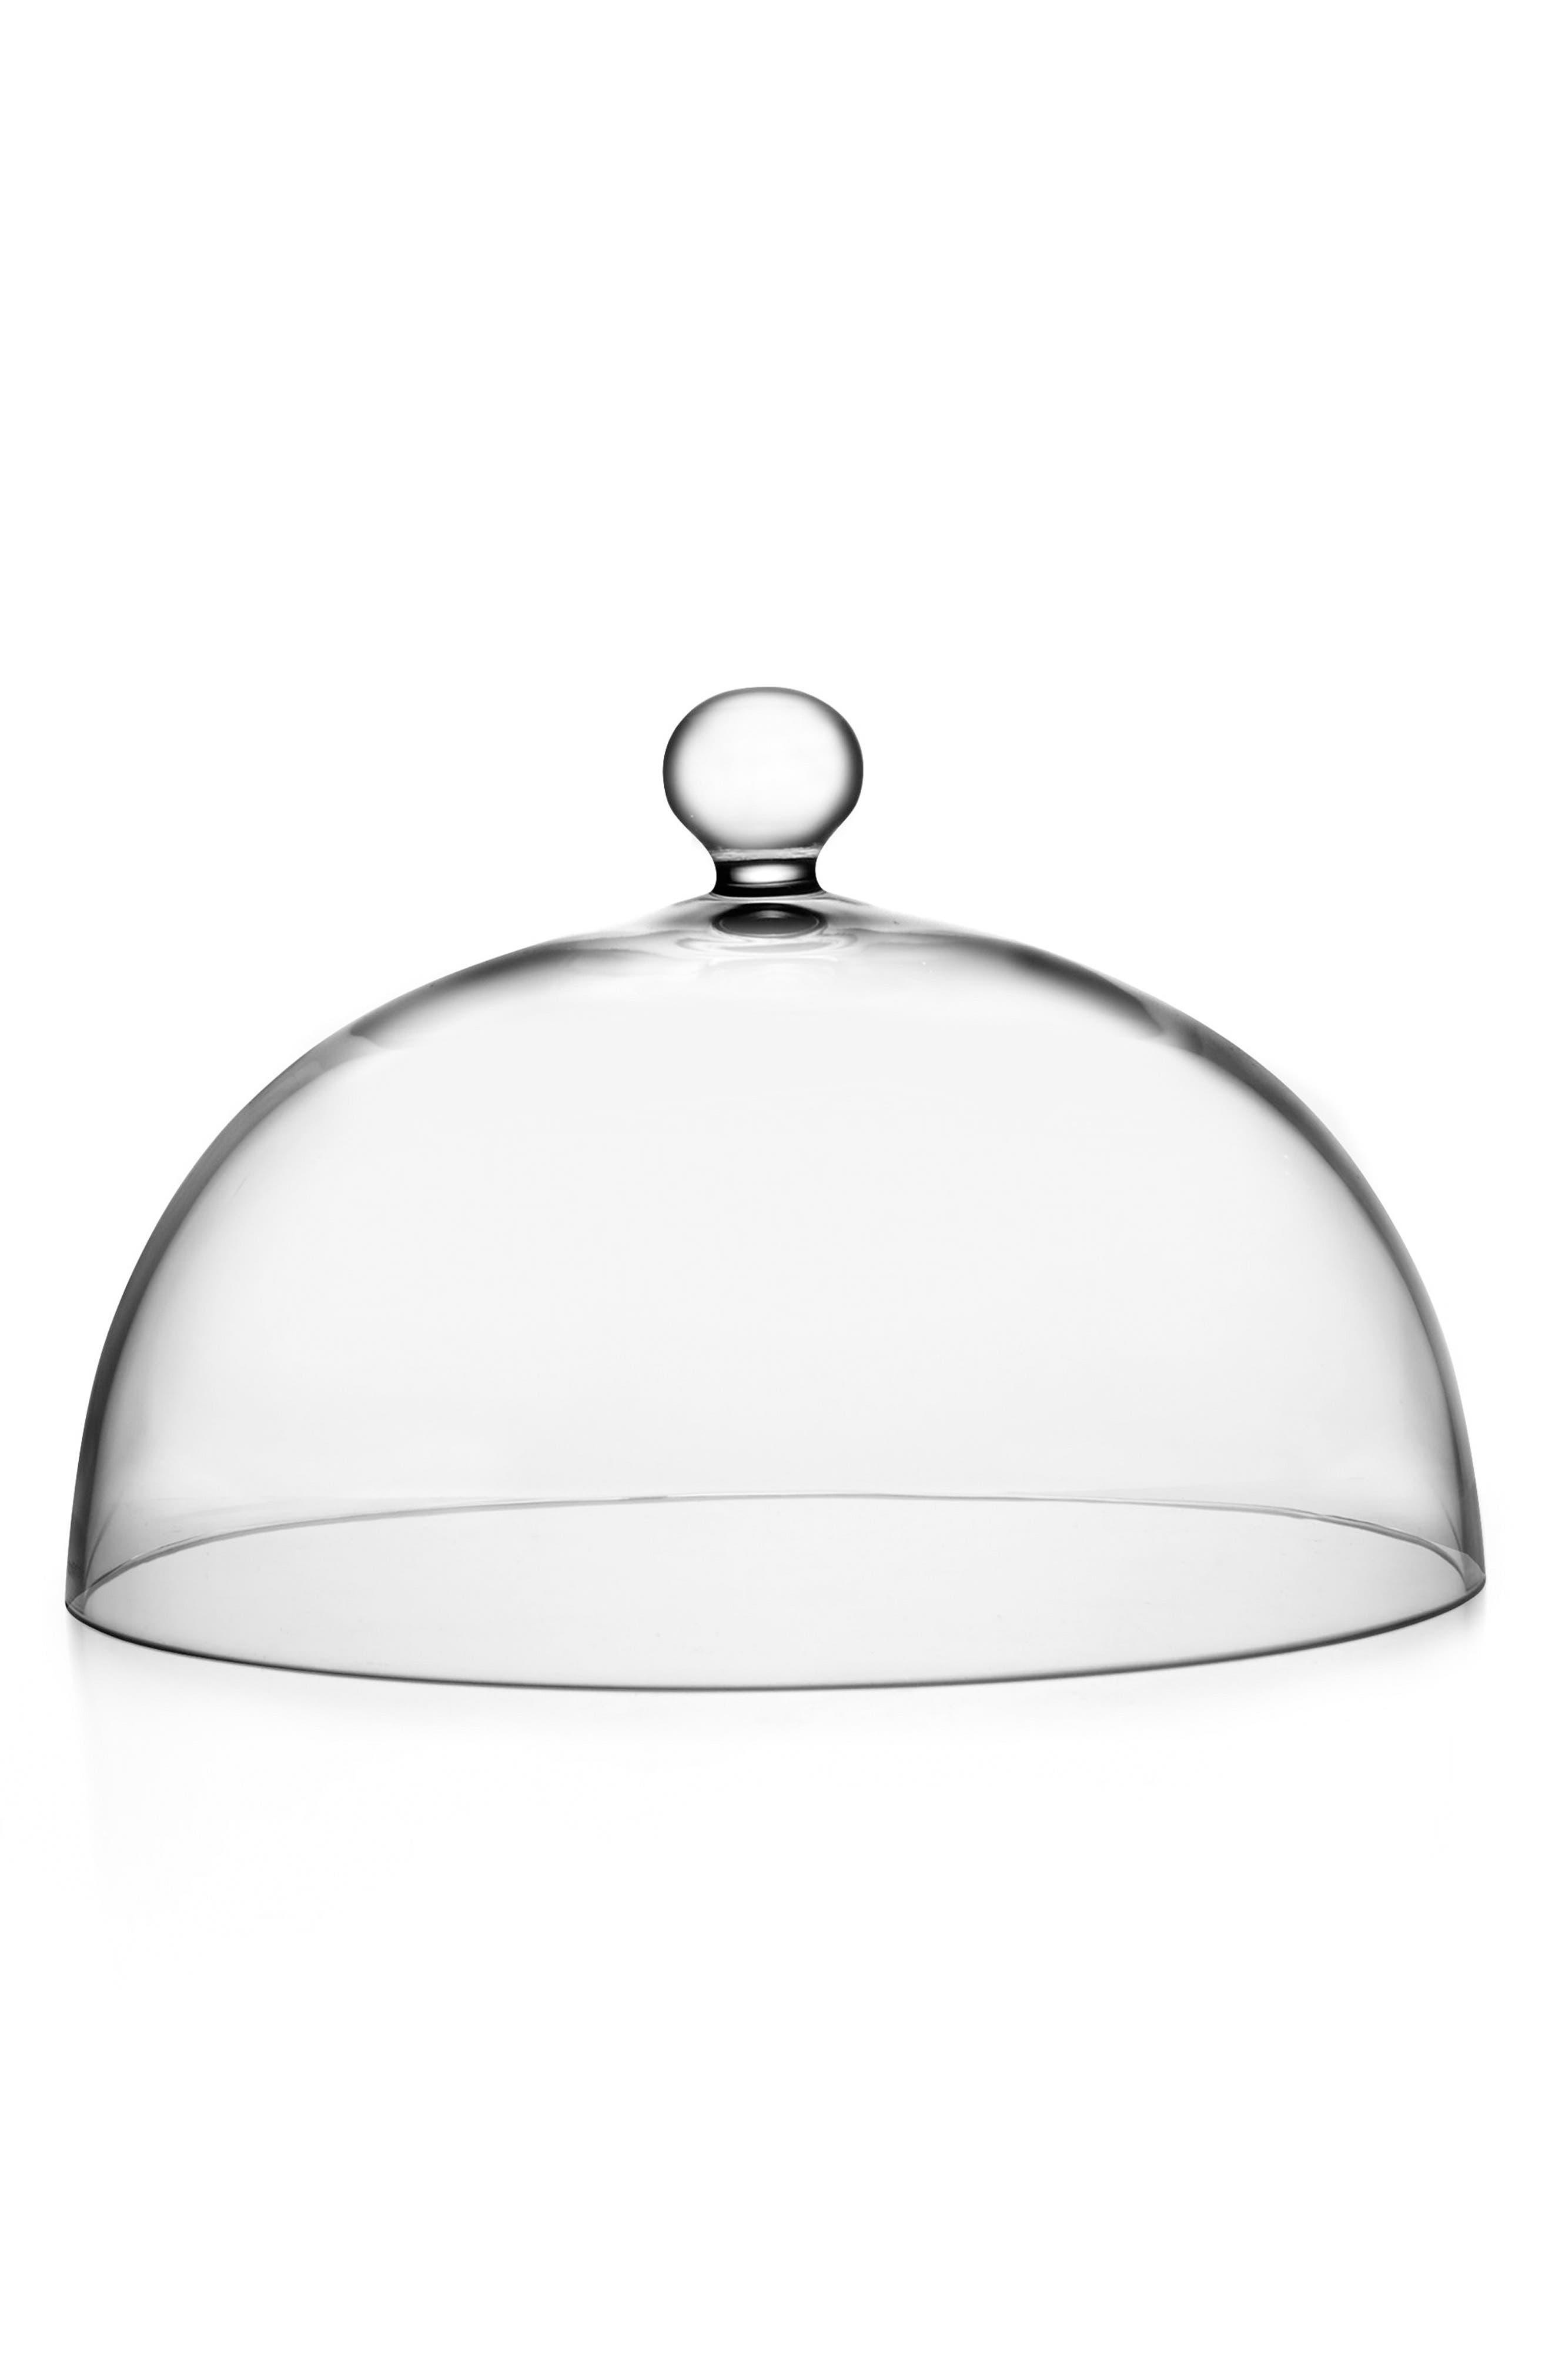 Main Image - Nambé Moderne Large Cake Dome